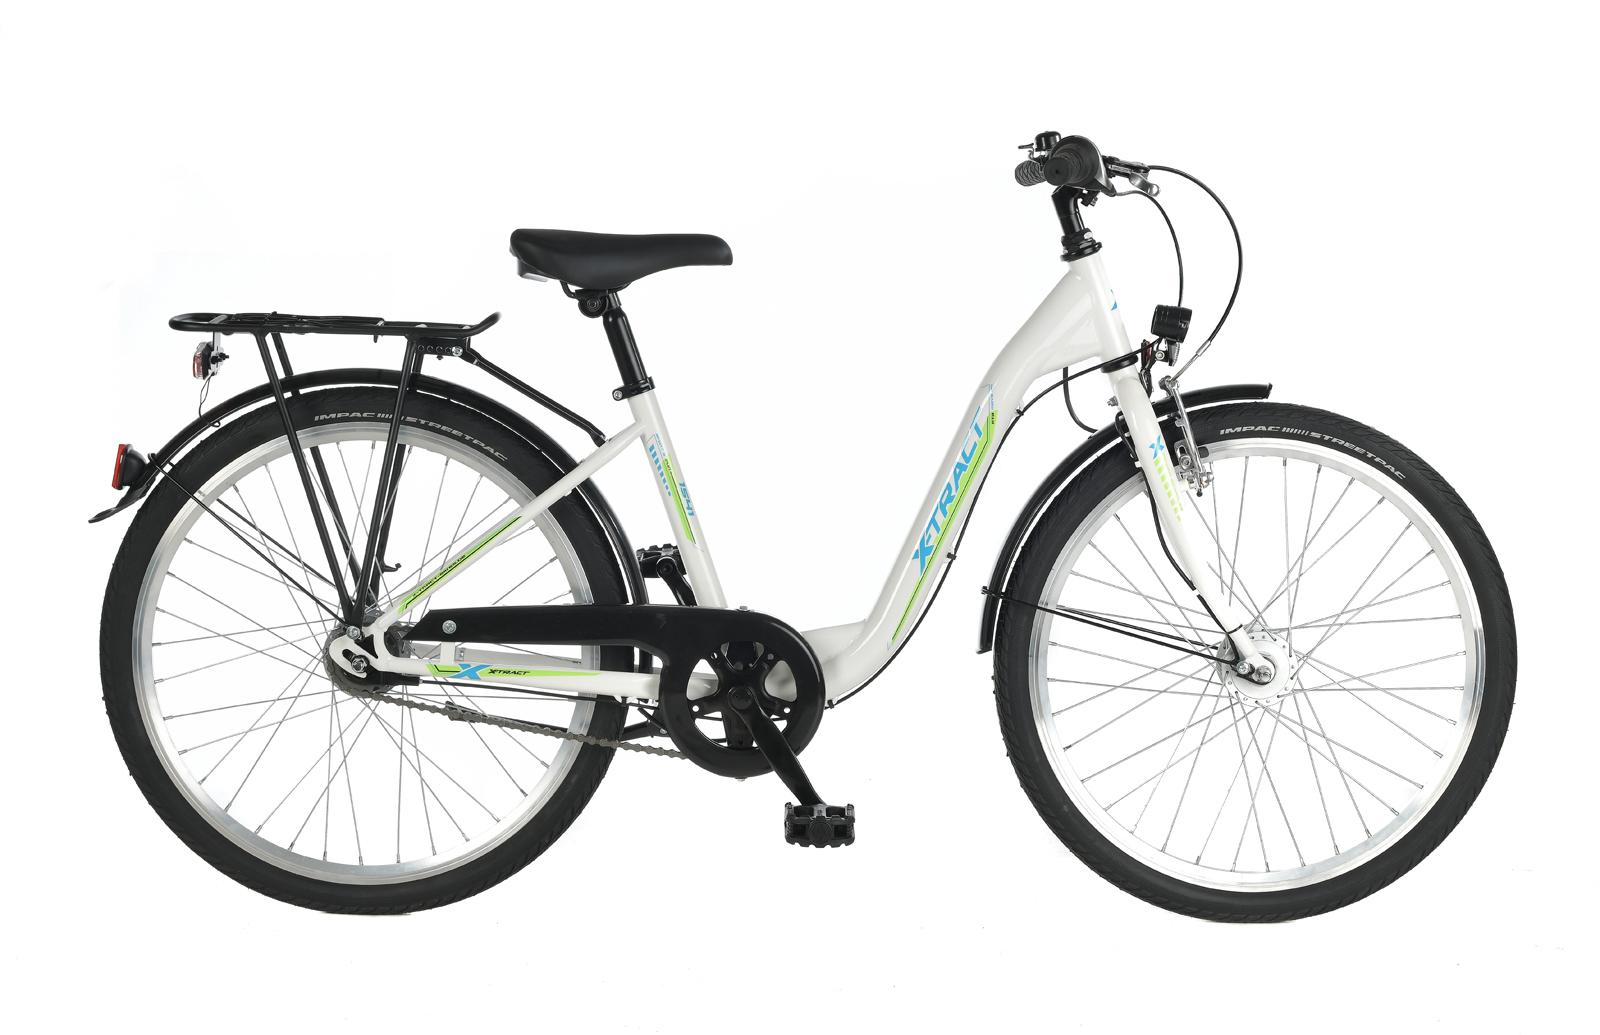 X Tract Atb Kette 24 Zoll School Feldmeier Bikes